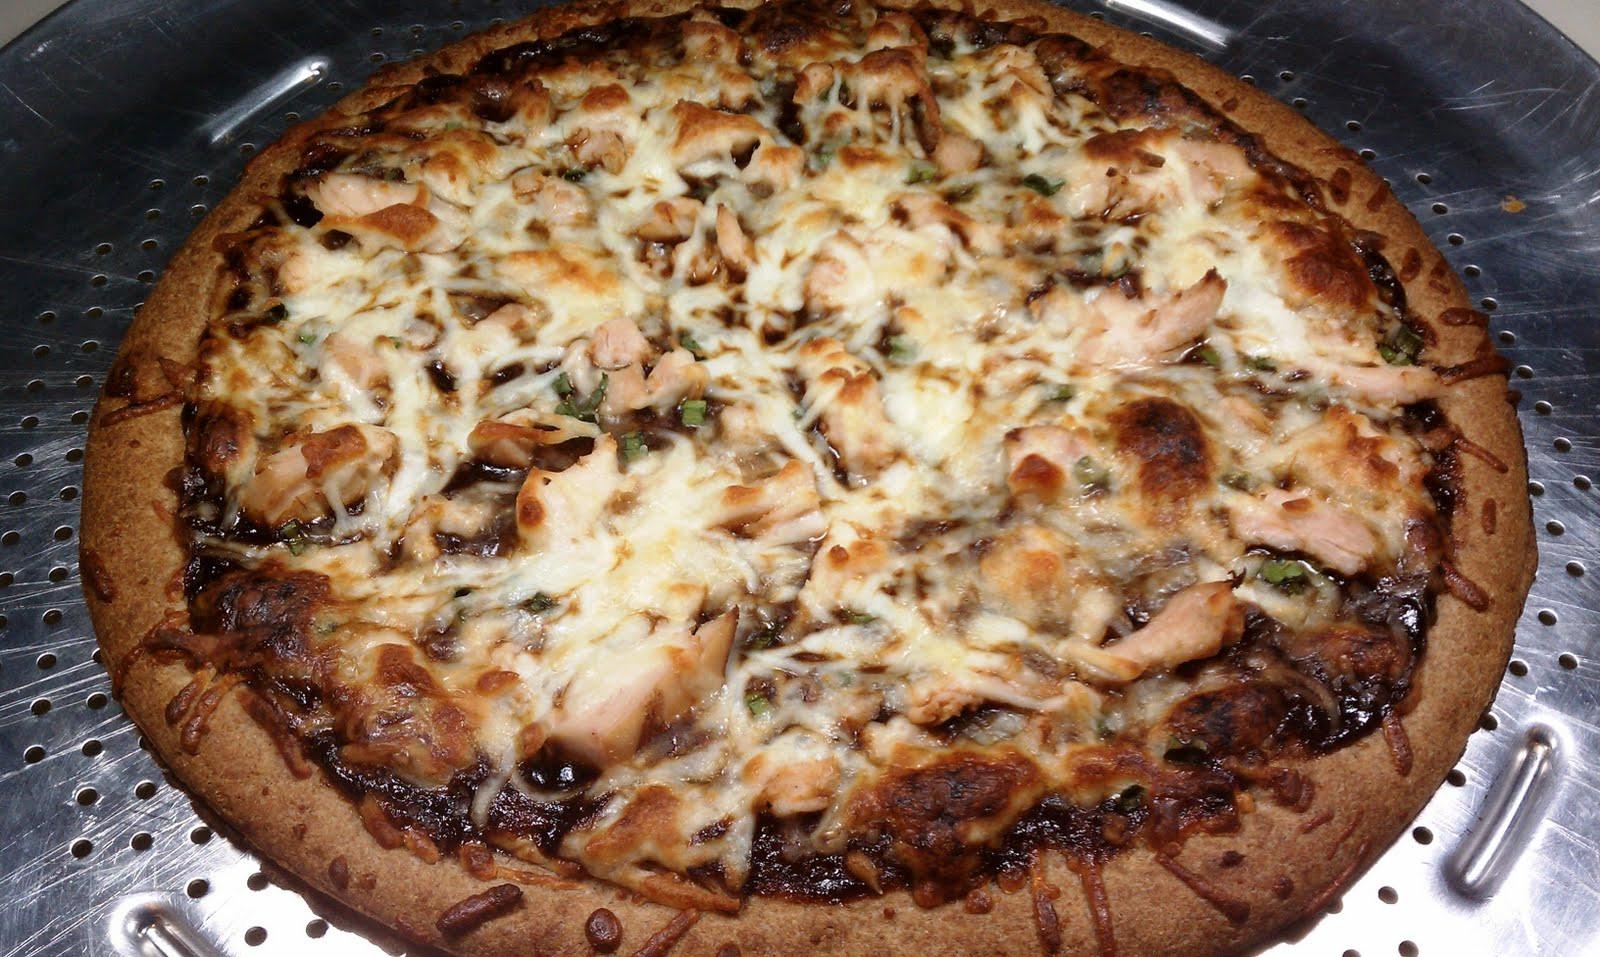 Barbeque Chicken Pizza  Barbecue Chicken Pizza Emily Bites